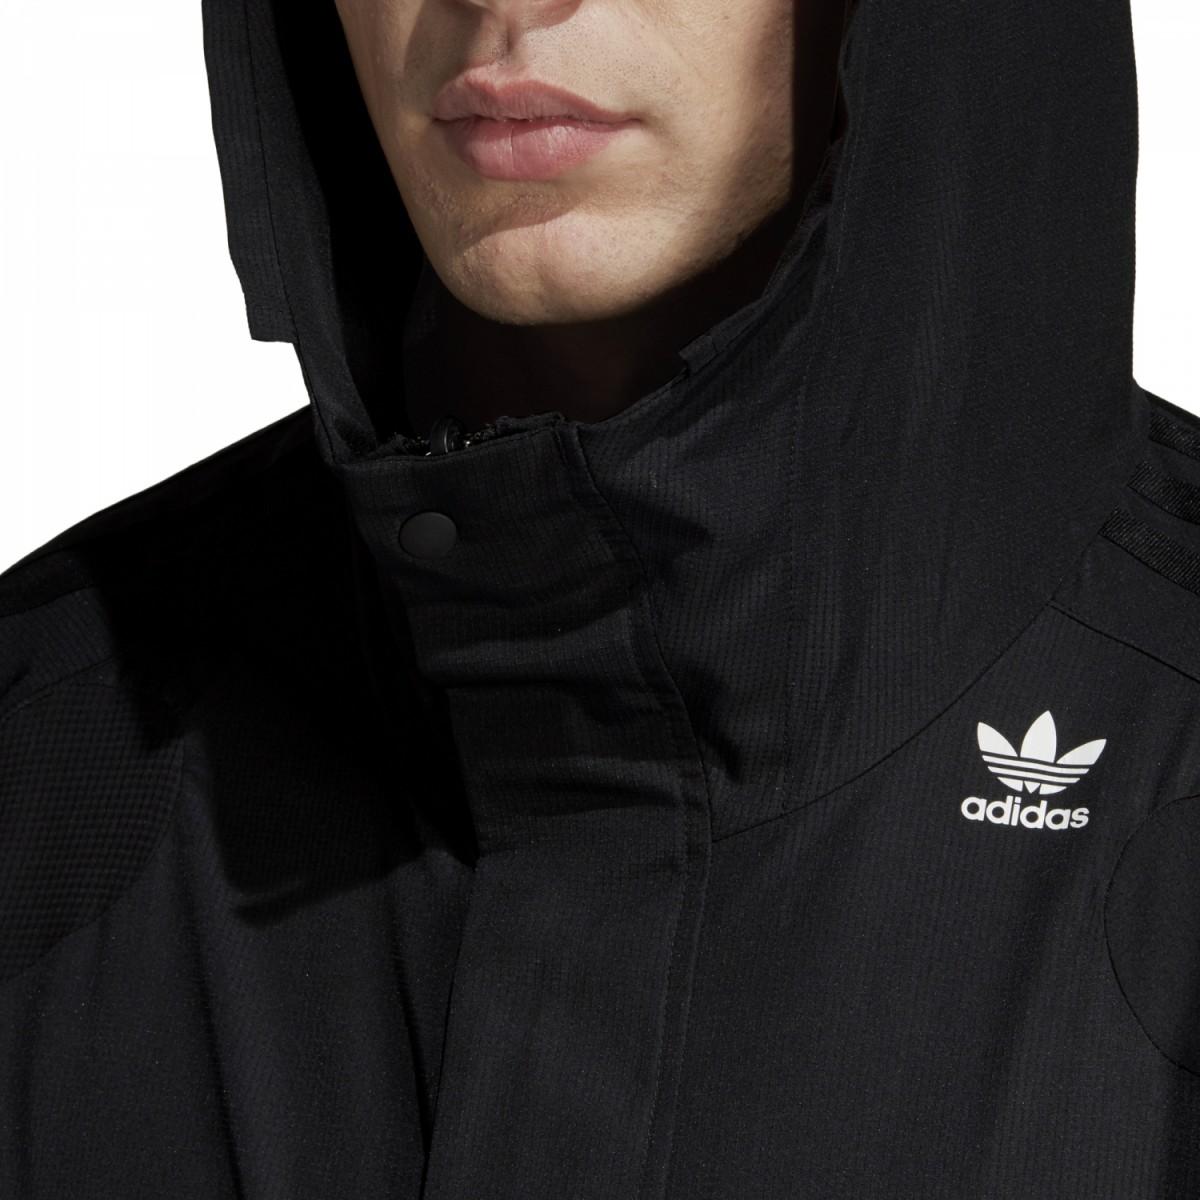 adidas Originals PT3 Karkaj Jacket